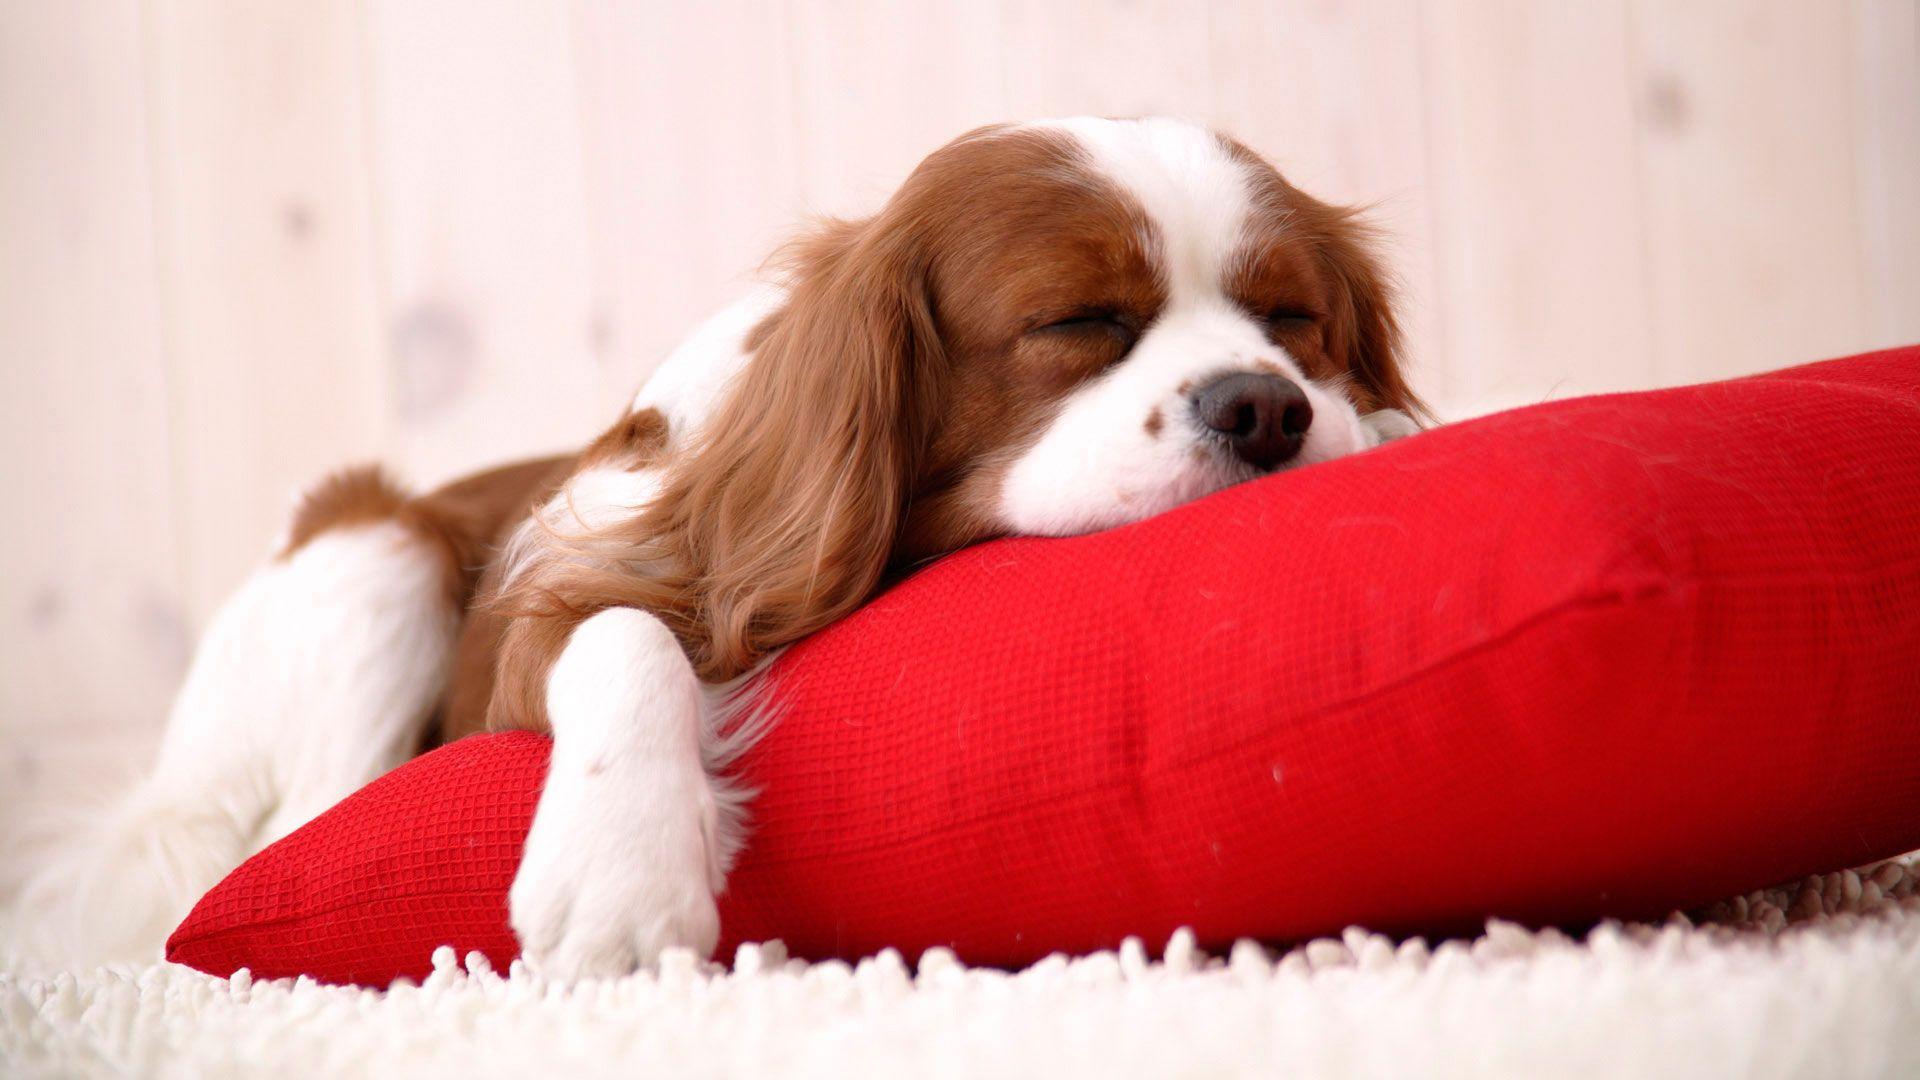 Nice place for sleep cute animals pinterest nice place